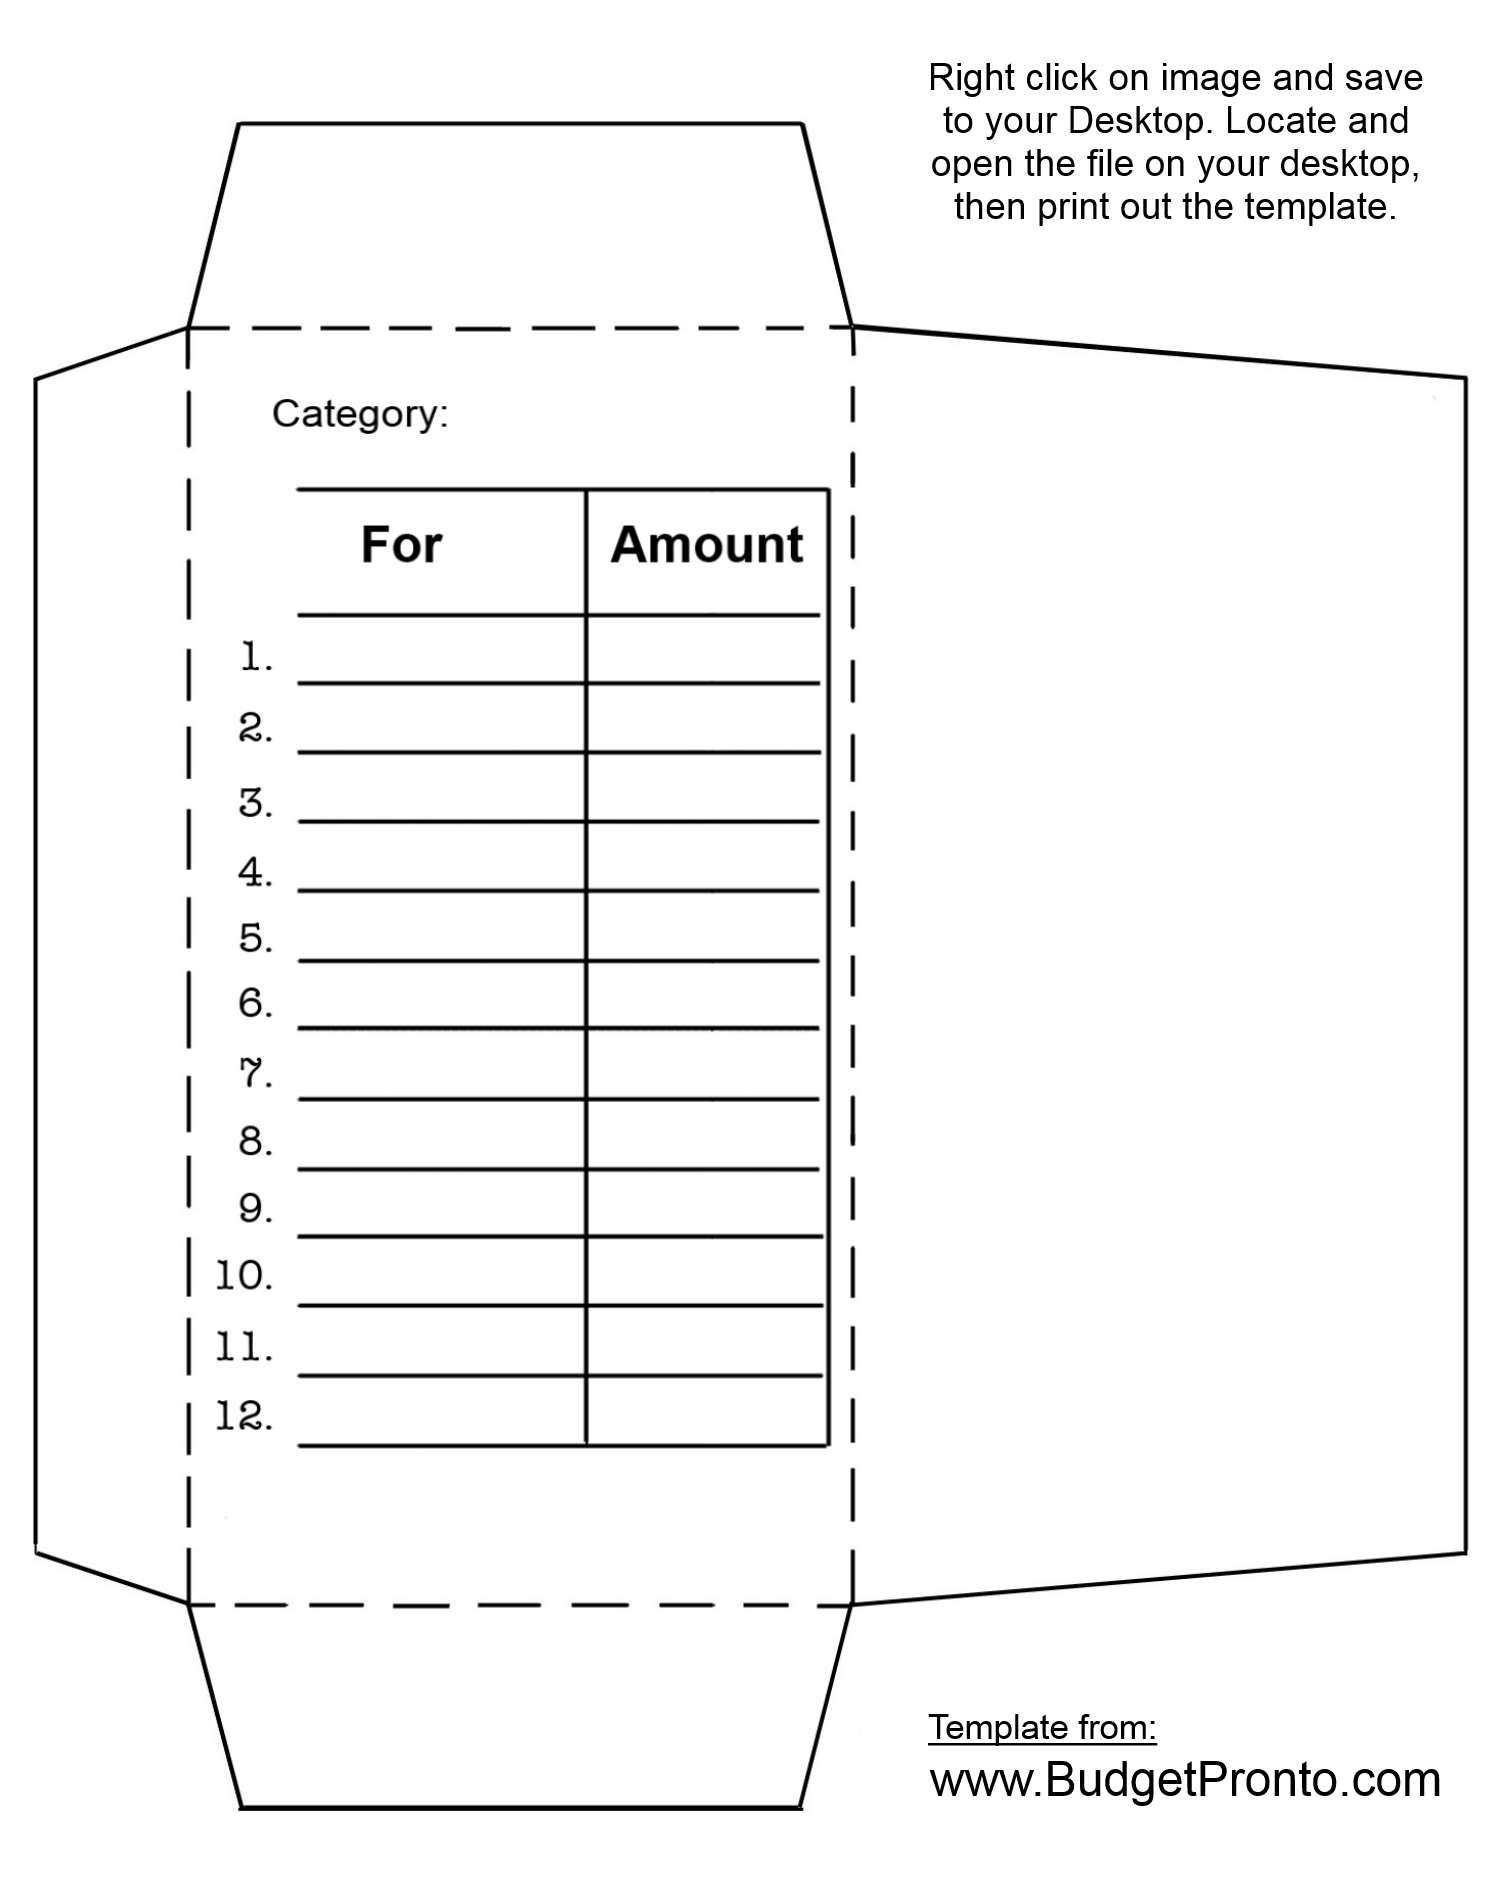 Cash Envelope Printout Template | Budgeting | Pinterest ...